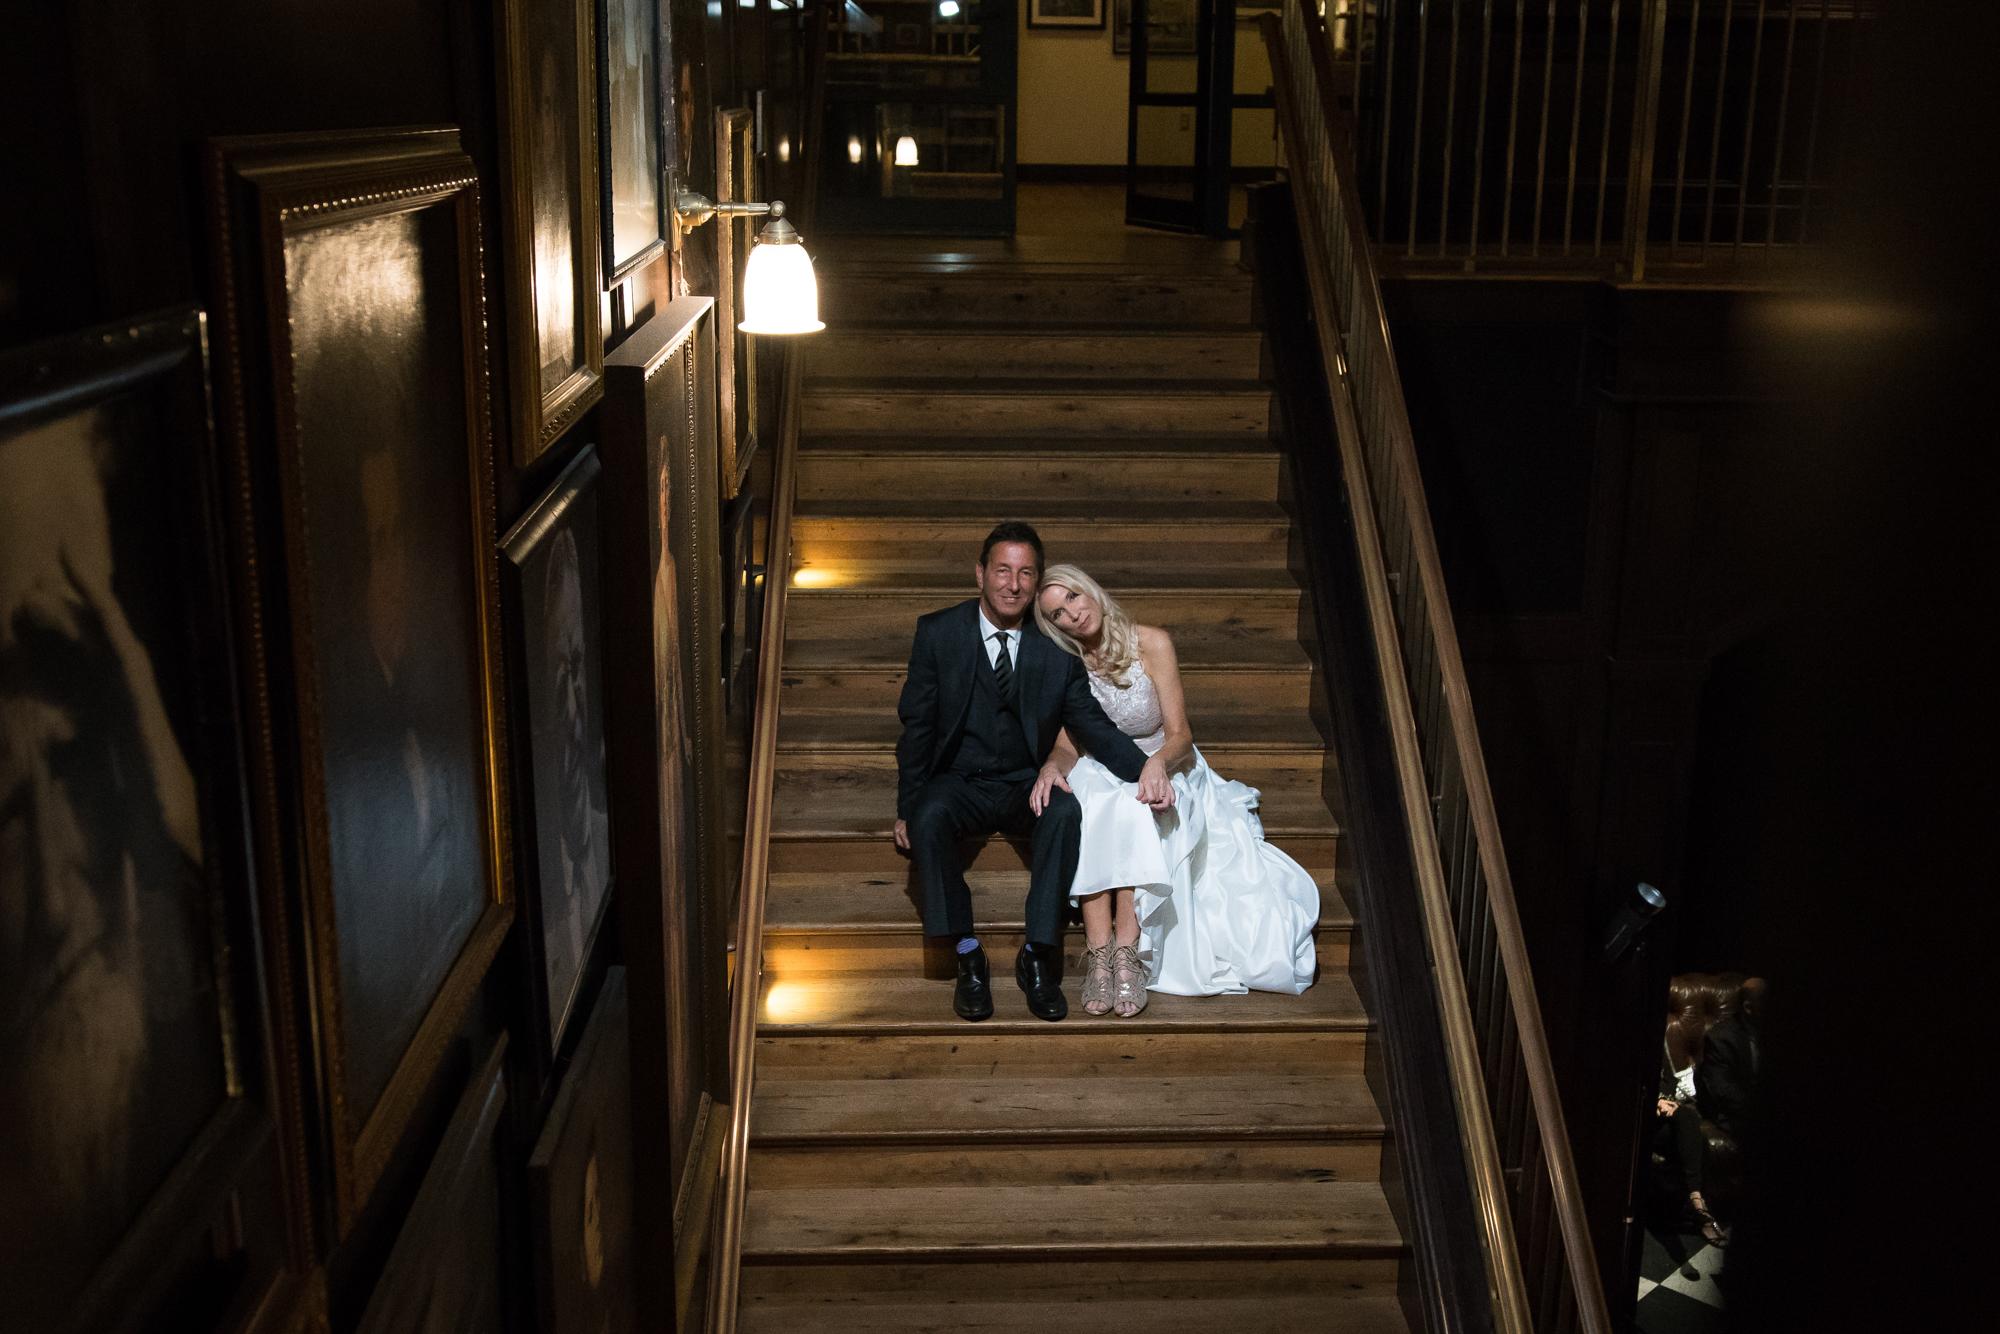 Oxford-Exchange-wedding-photographer